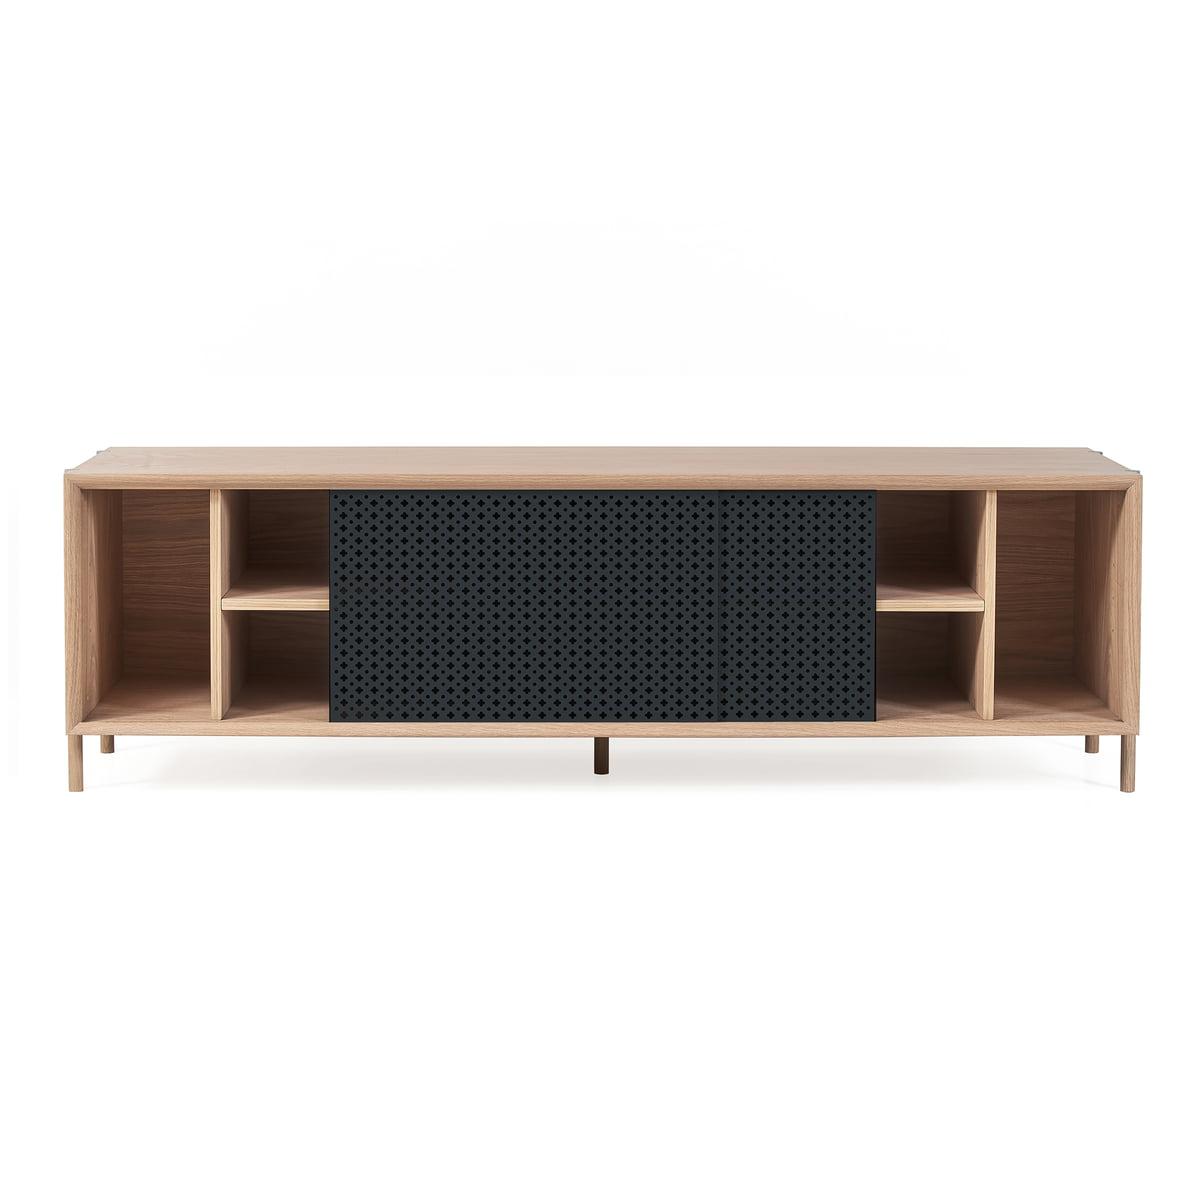 gabin sideboard cm by hart connox. Black Bedroom Furniture Sets. Home Design Ideas